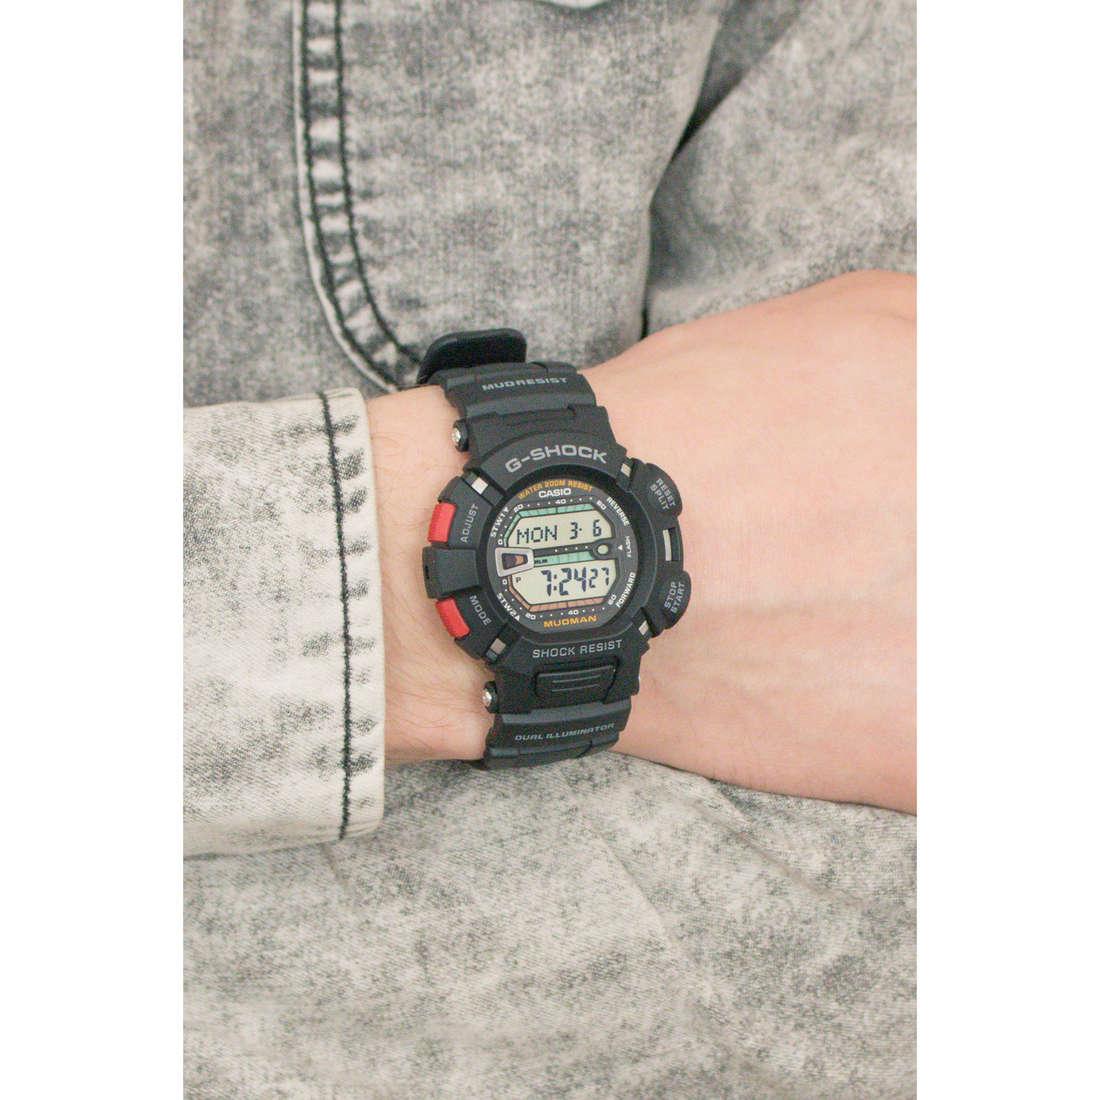 Casio digitali G-Shock uomo G-9000-1VER indosso